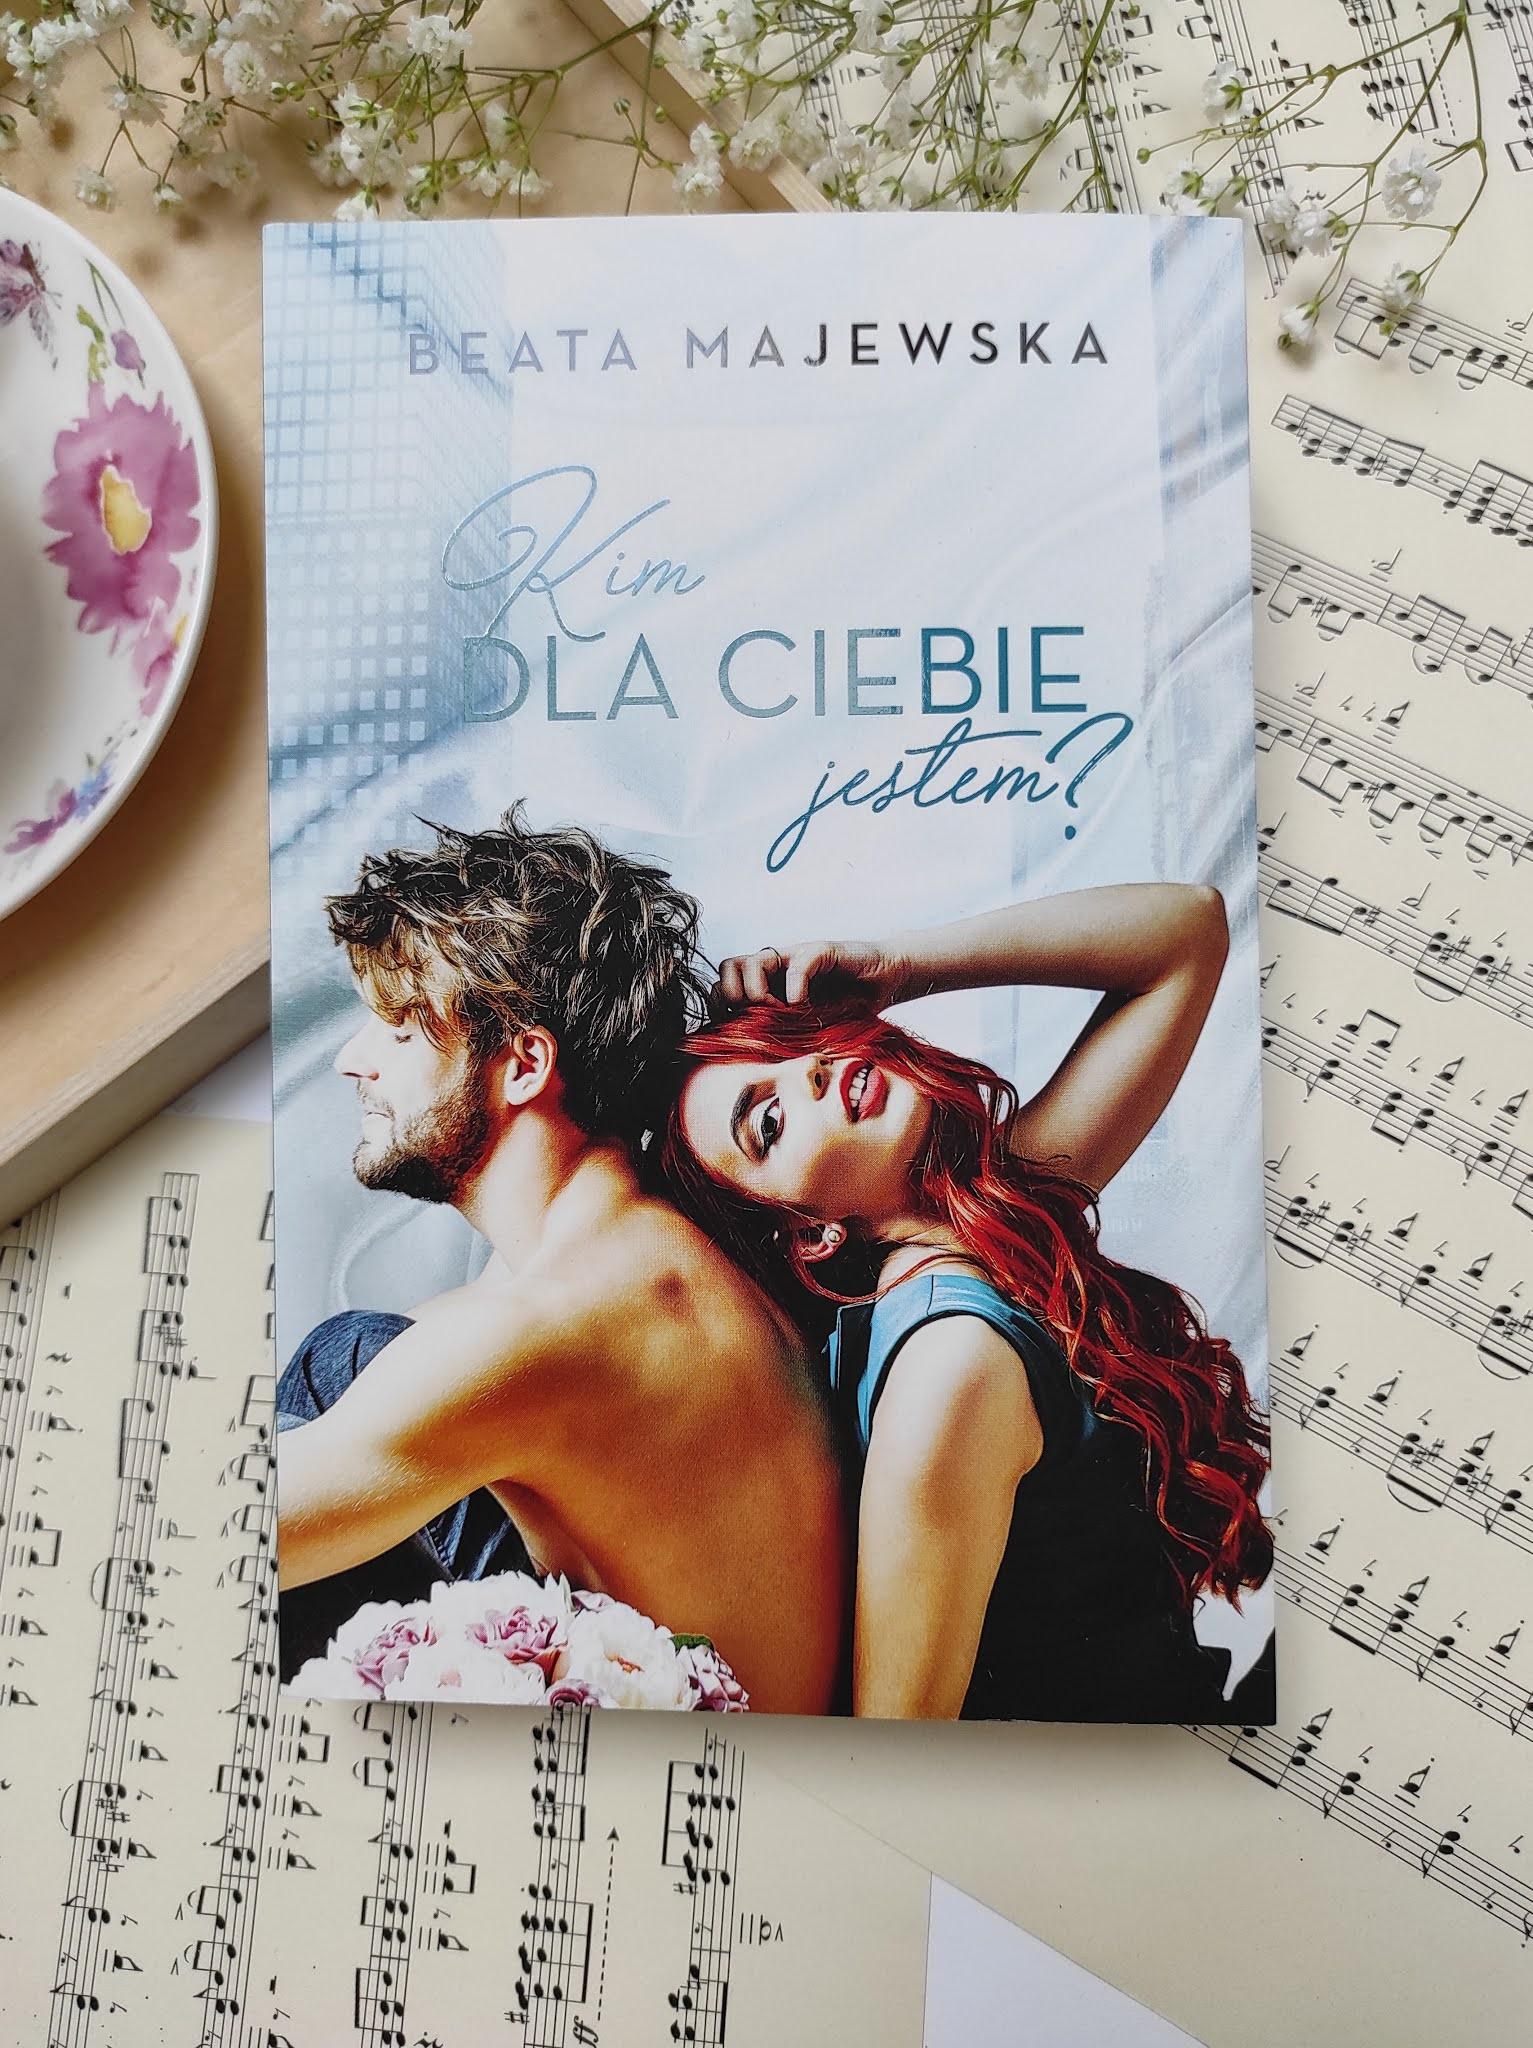 """Kim dla Ciebie jestem?"" Beata Majewska"